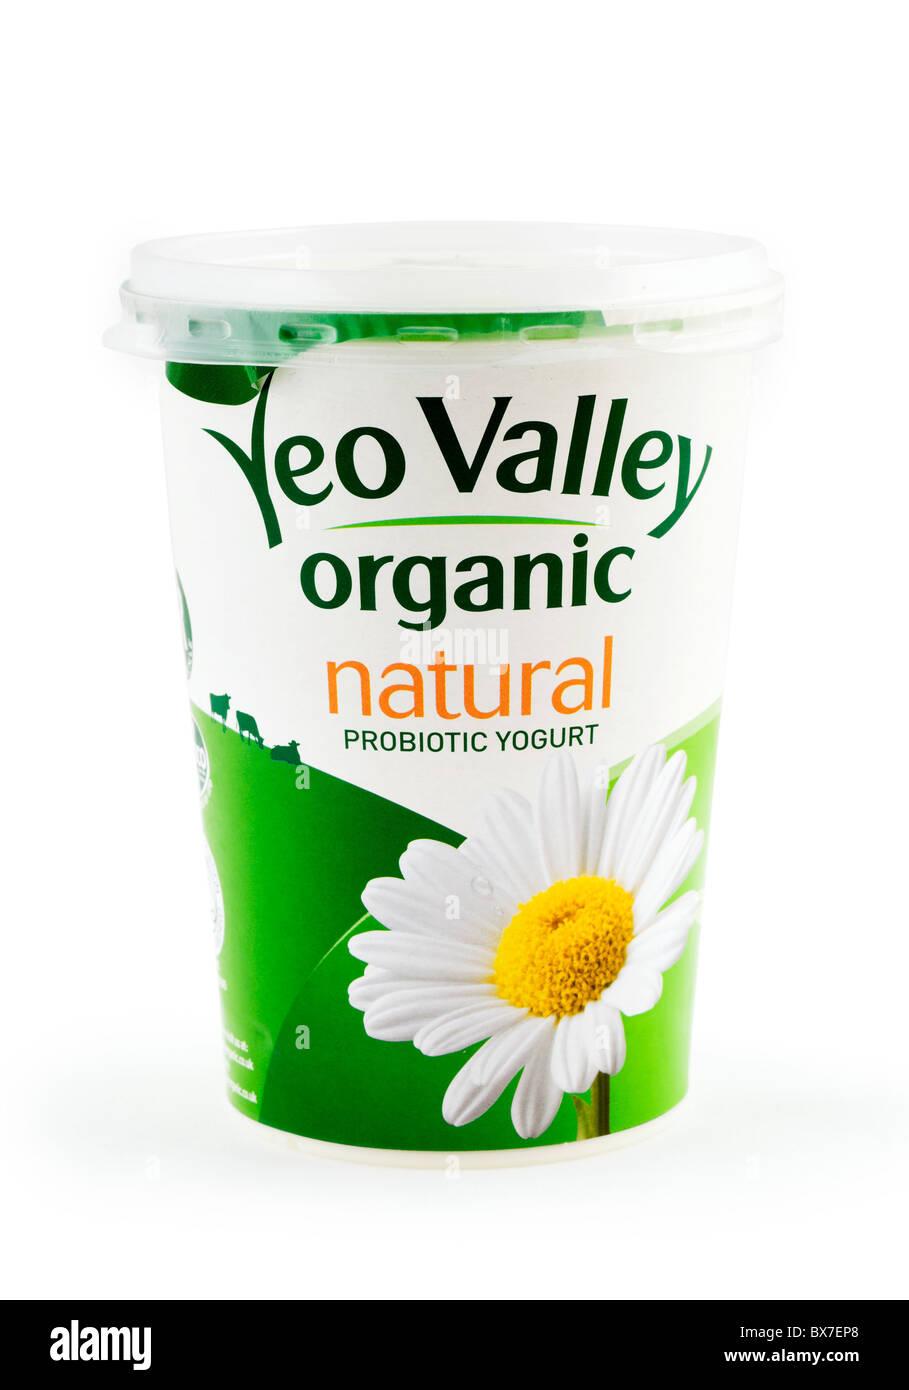 Large Pot of Yeo Valley Organic Yogurt - Stock Image